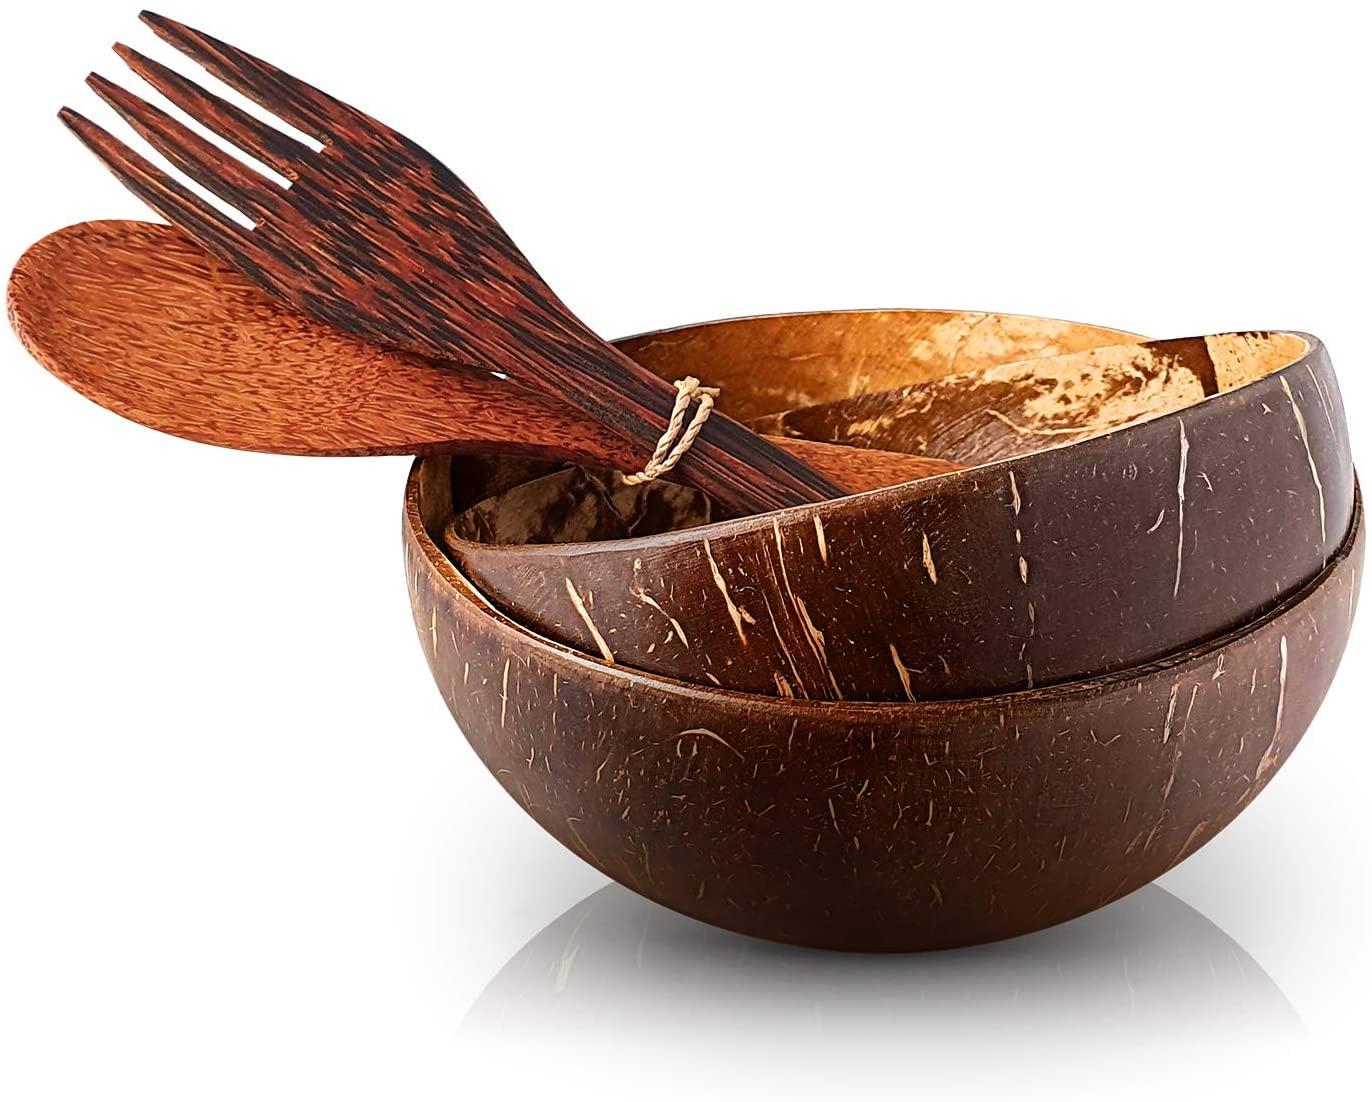 Eco Organic Wooden Cutlery Spoon Fork Vietnam Salad Smoothie Coconut Bowl Set